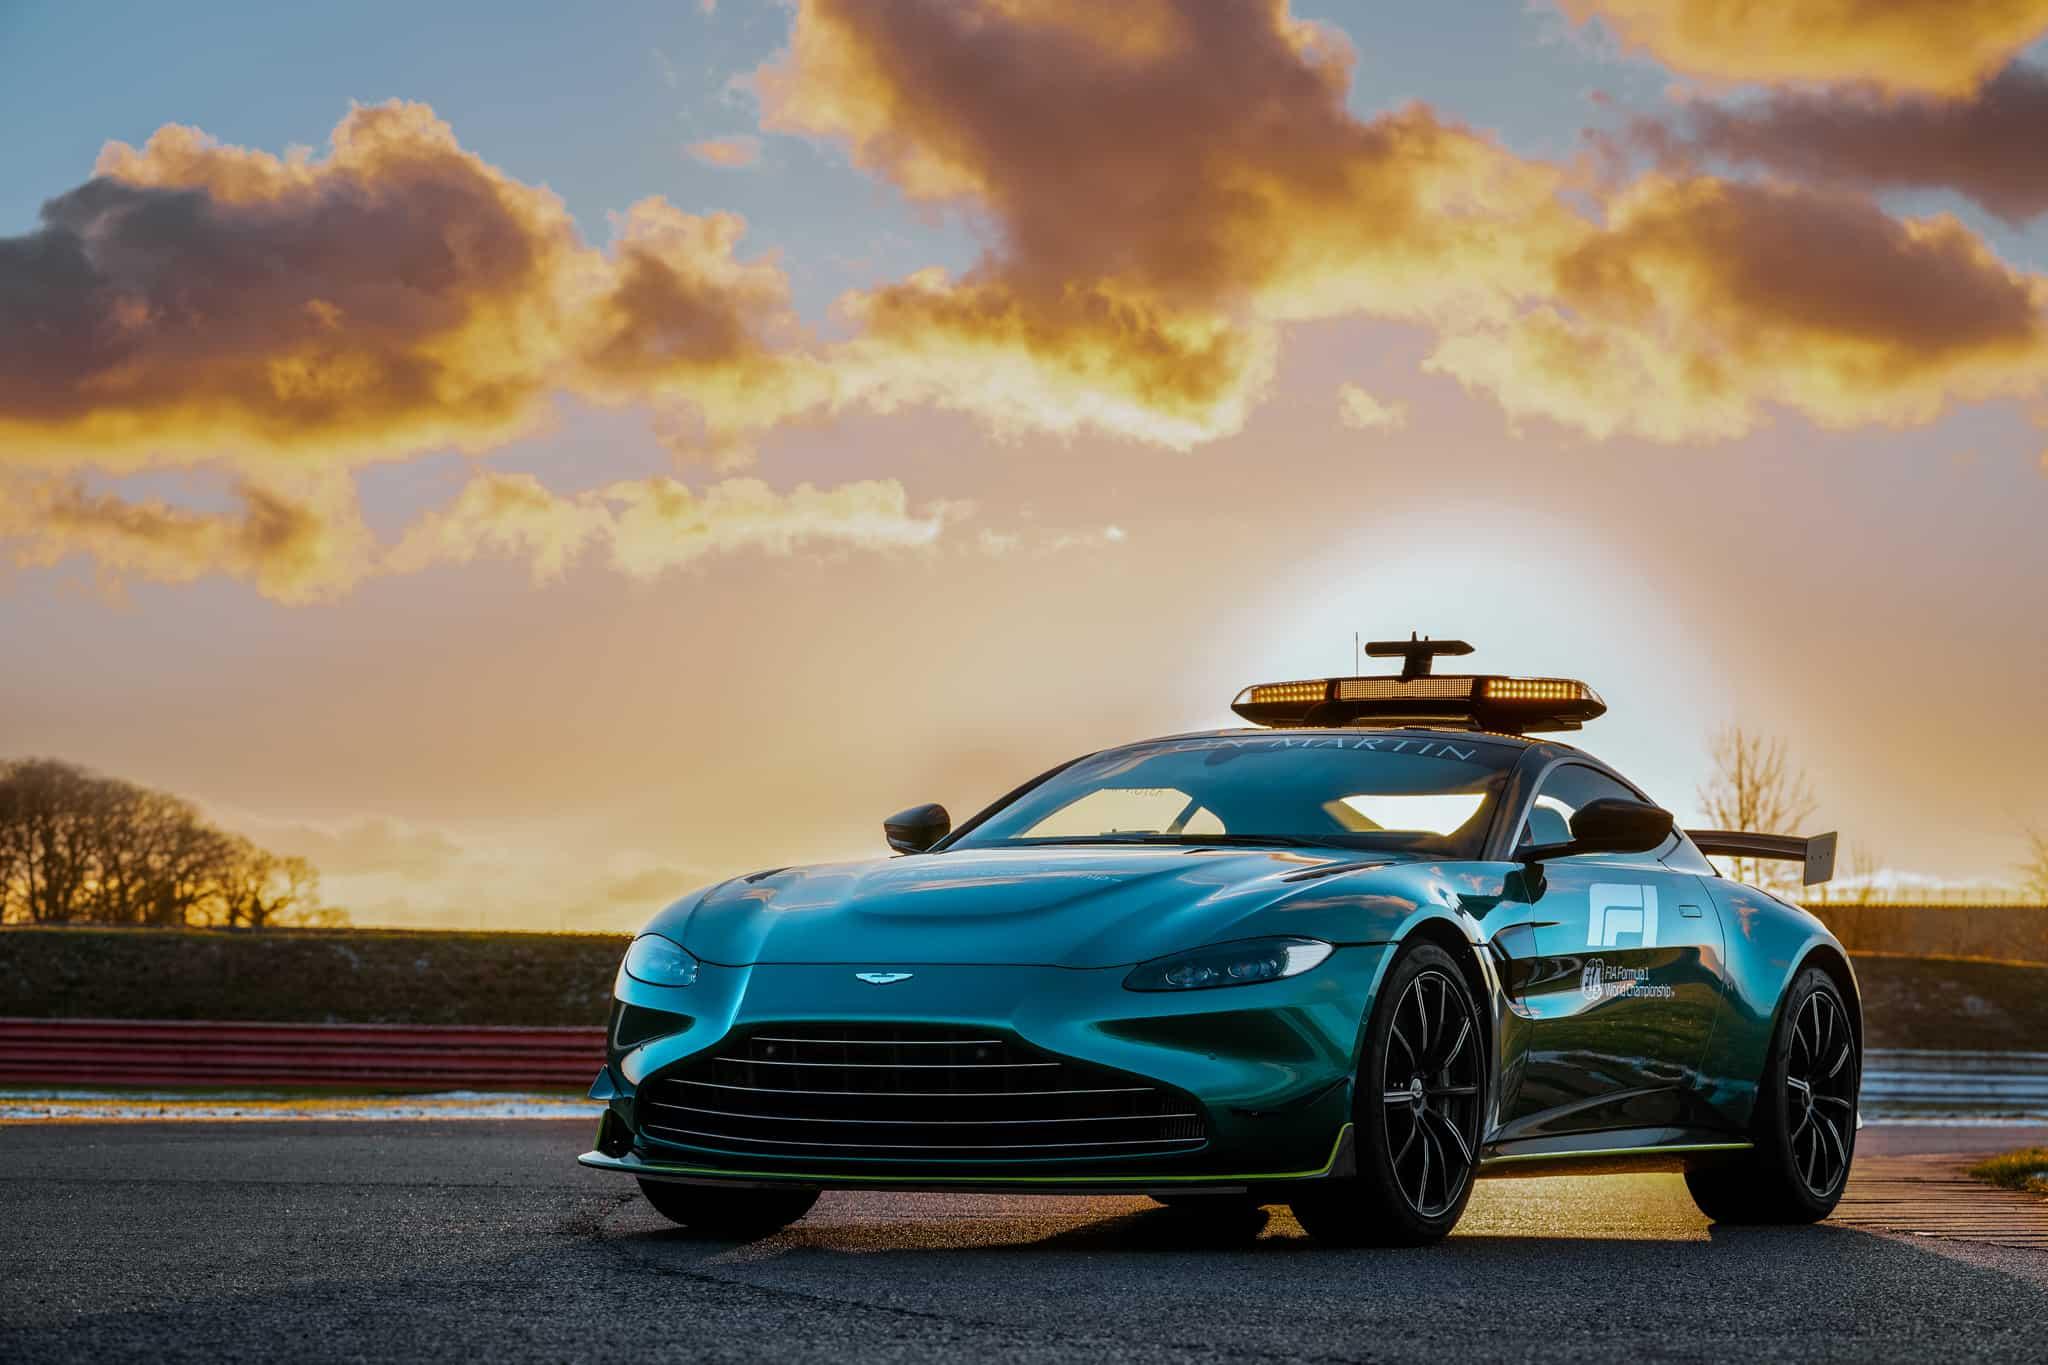 2021 Aston Martin safety car Photo Aston Martin